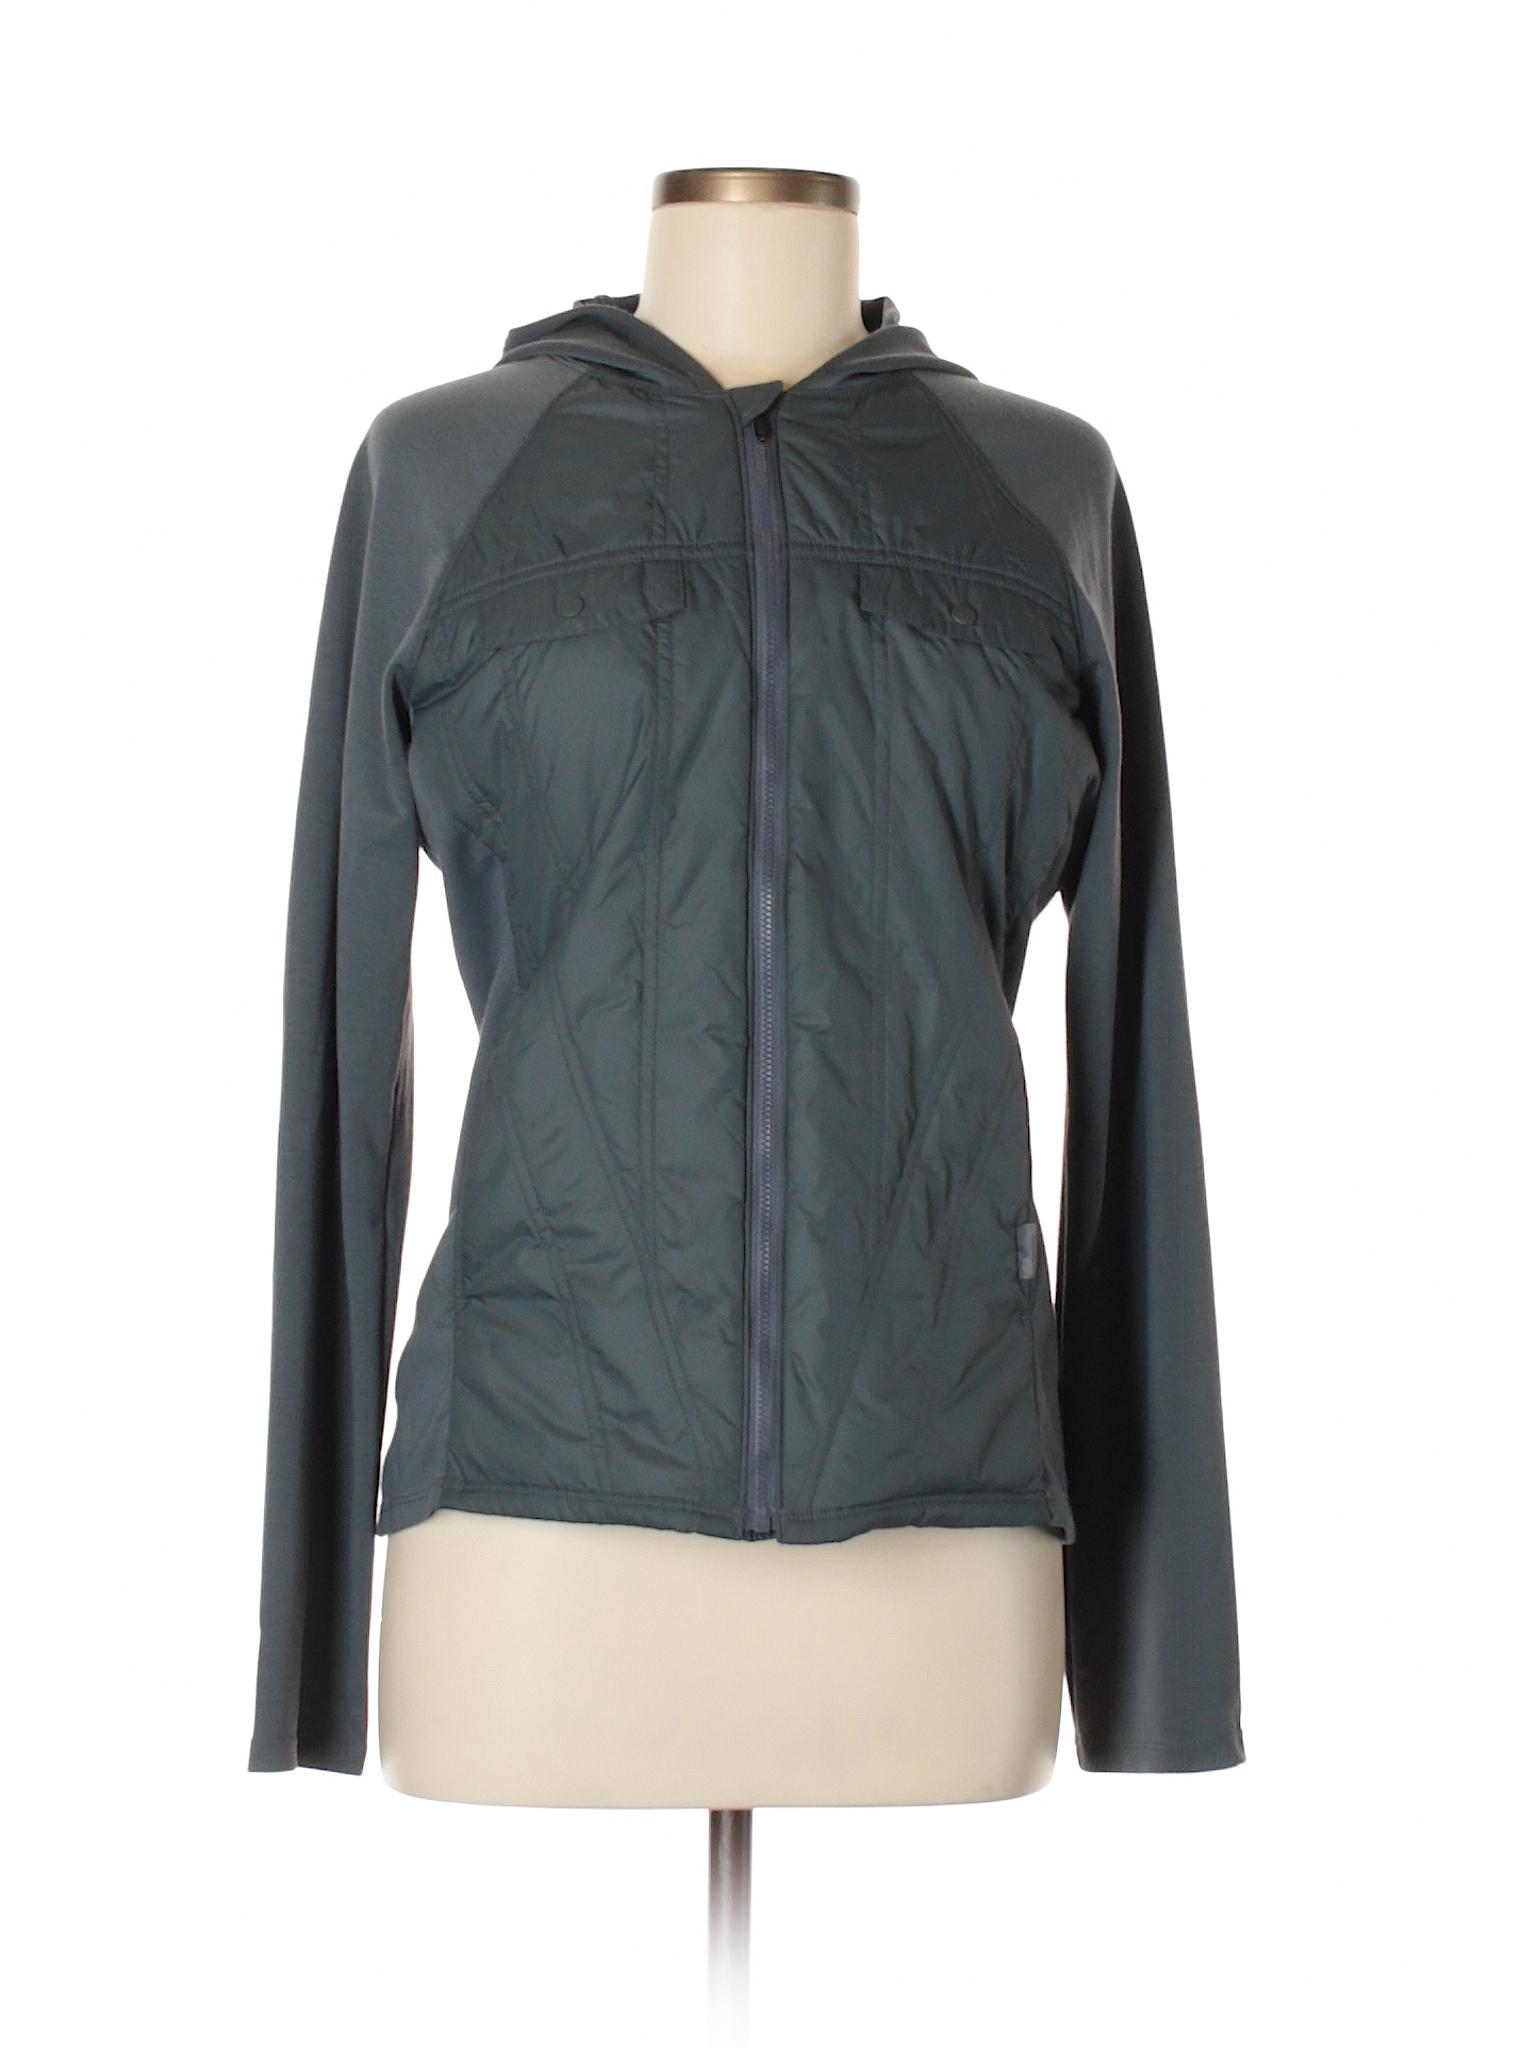 Jacket Mountain Hardwear Boutique Jacket leisure Hardwear leisure Boutique Mountain 6q8Pf